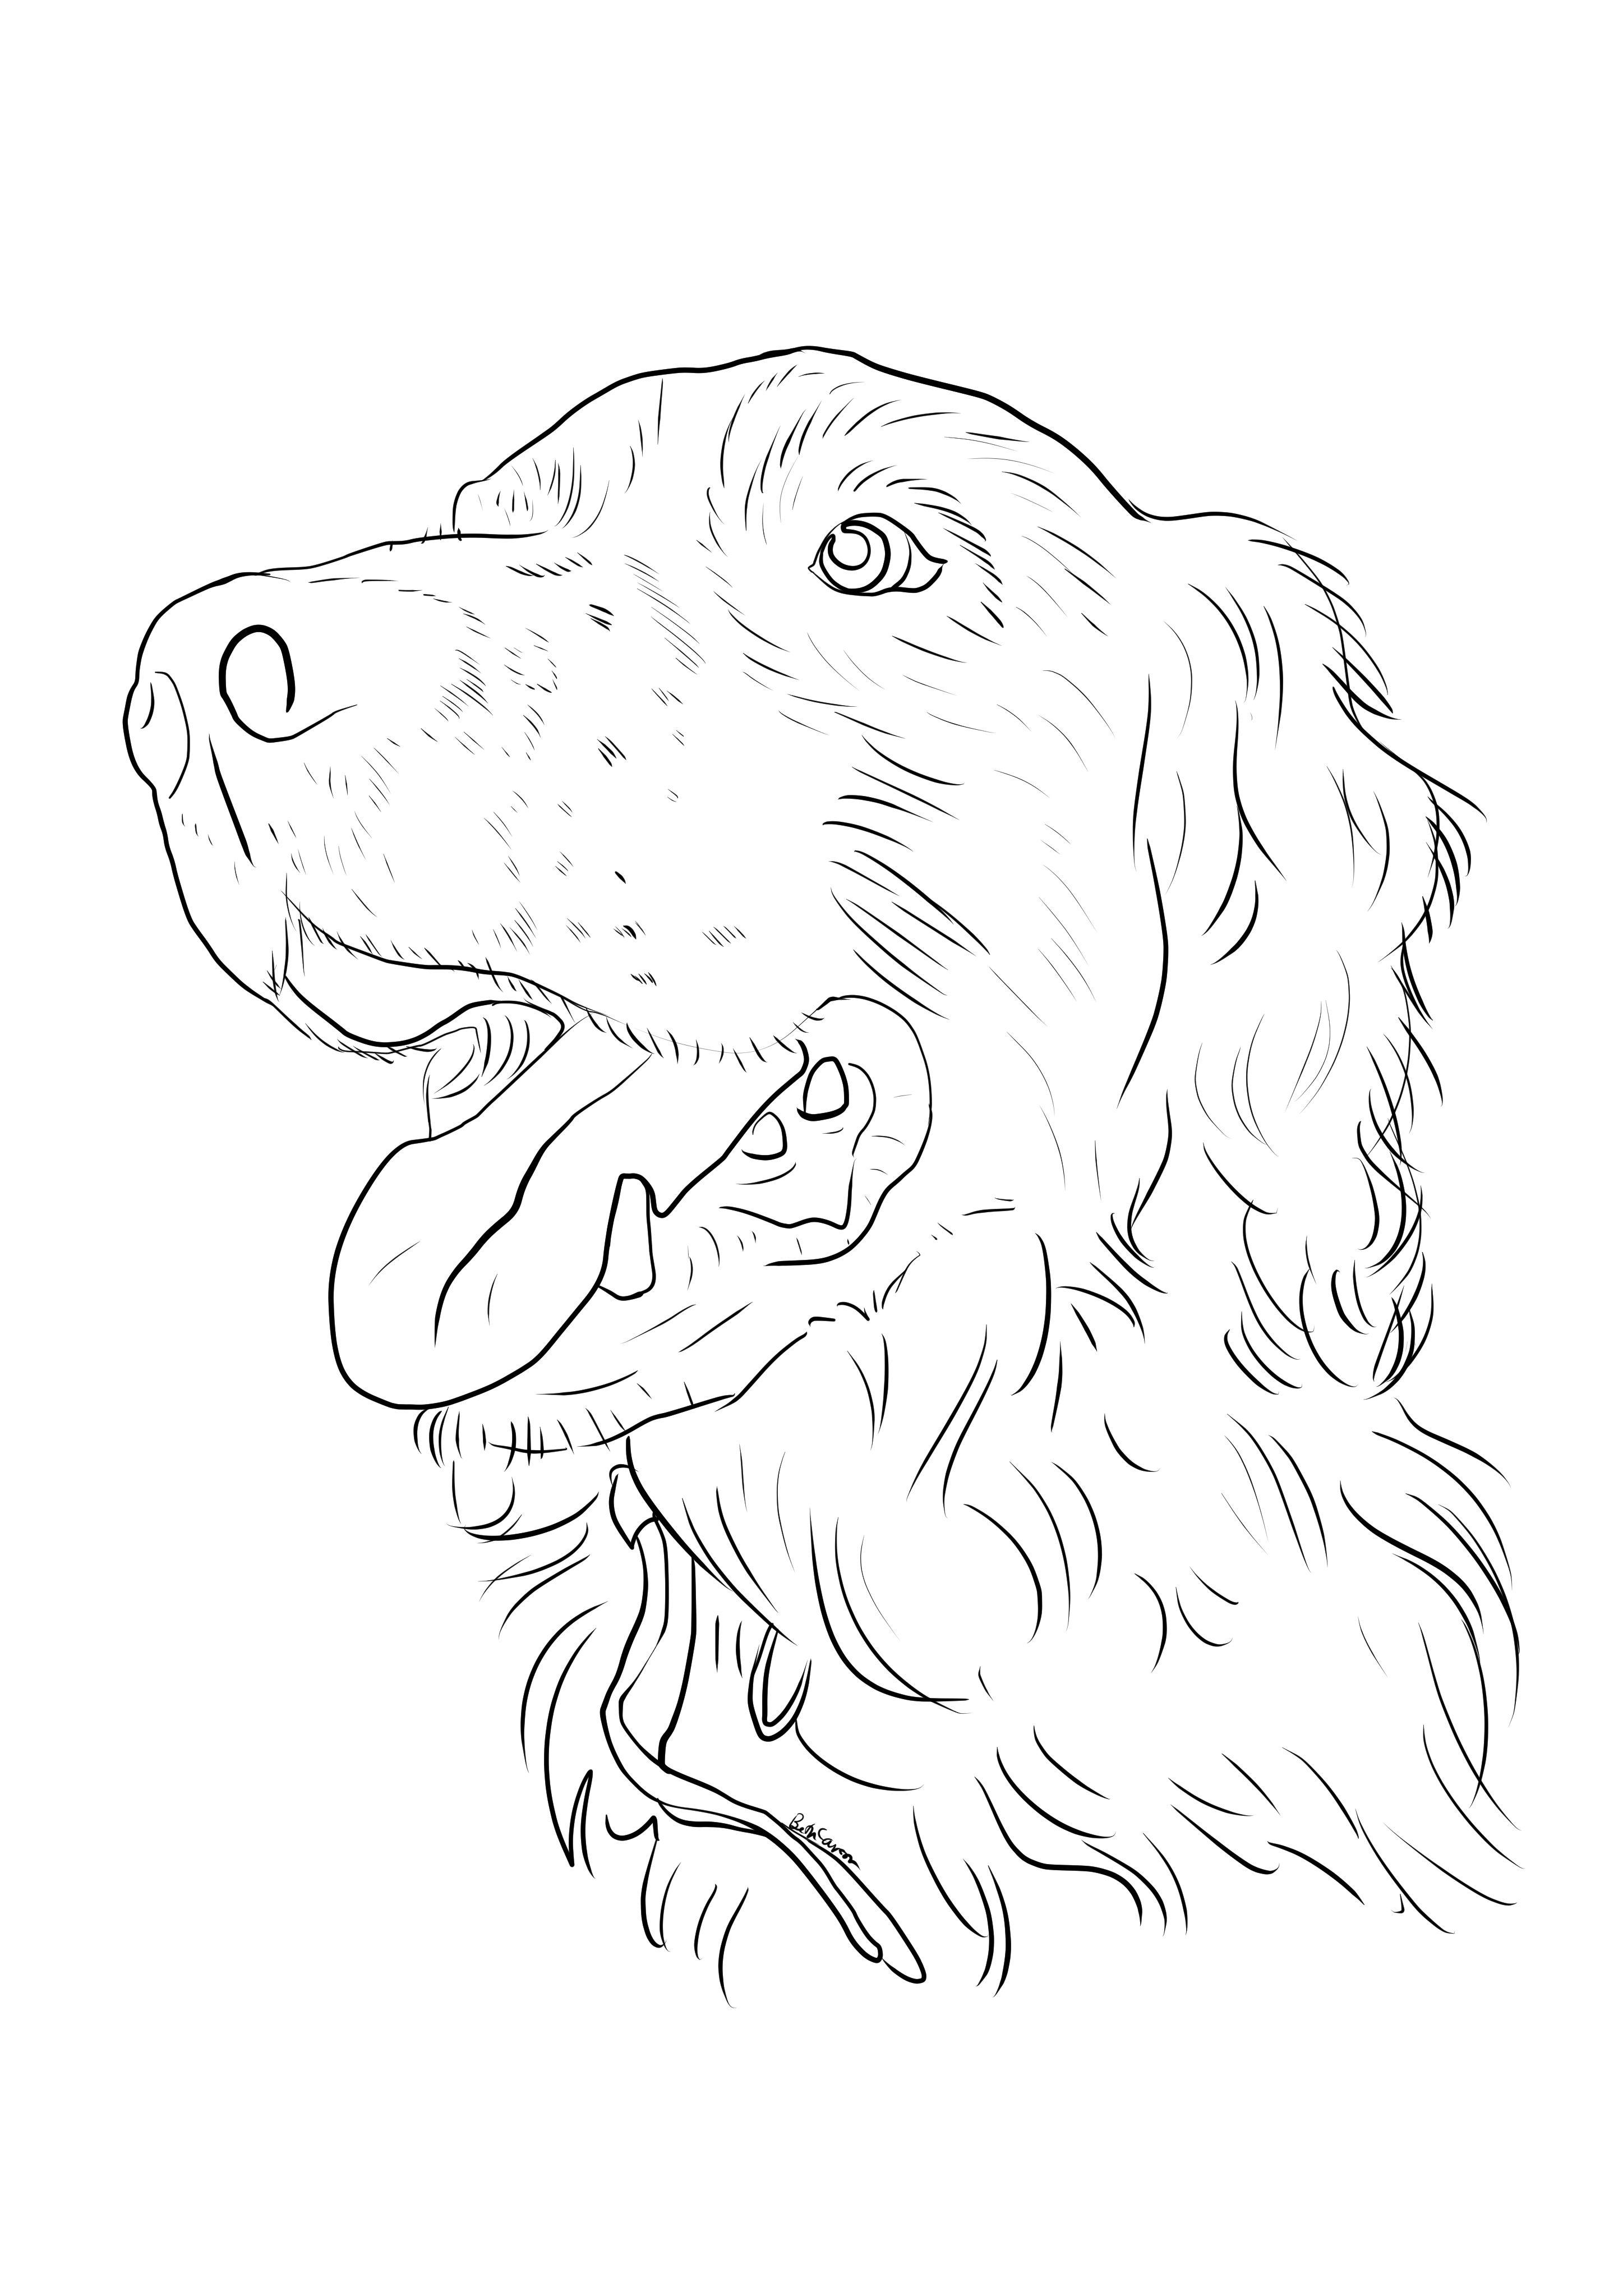 Springer Spaniel coloring page! Beth Carson 2014